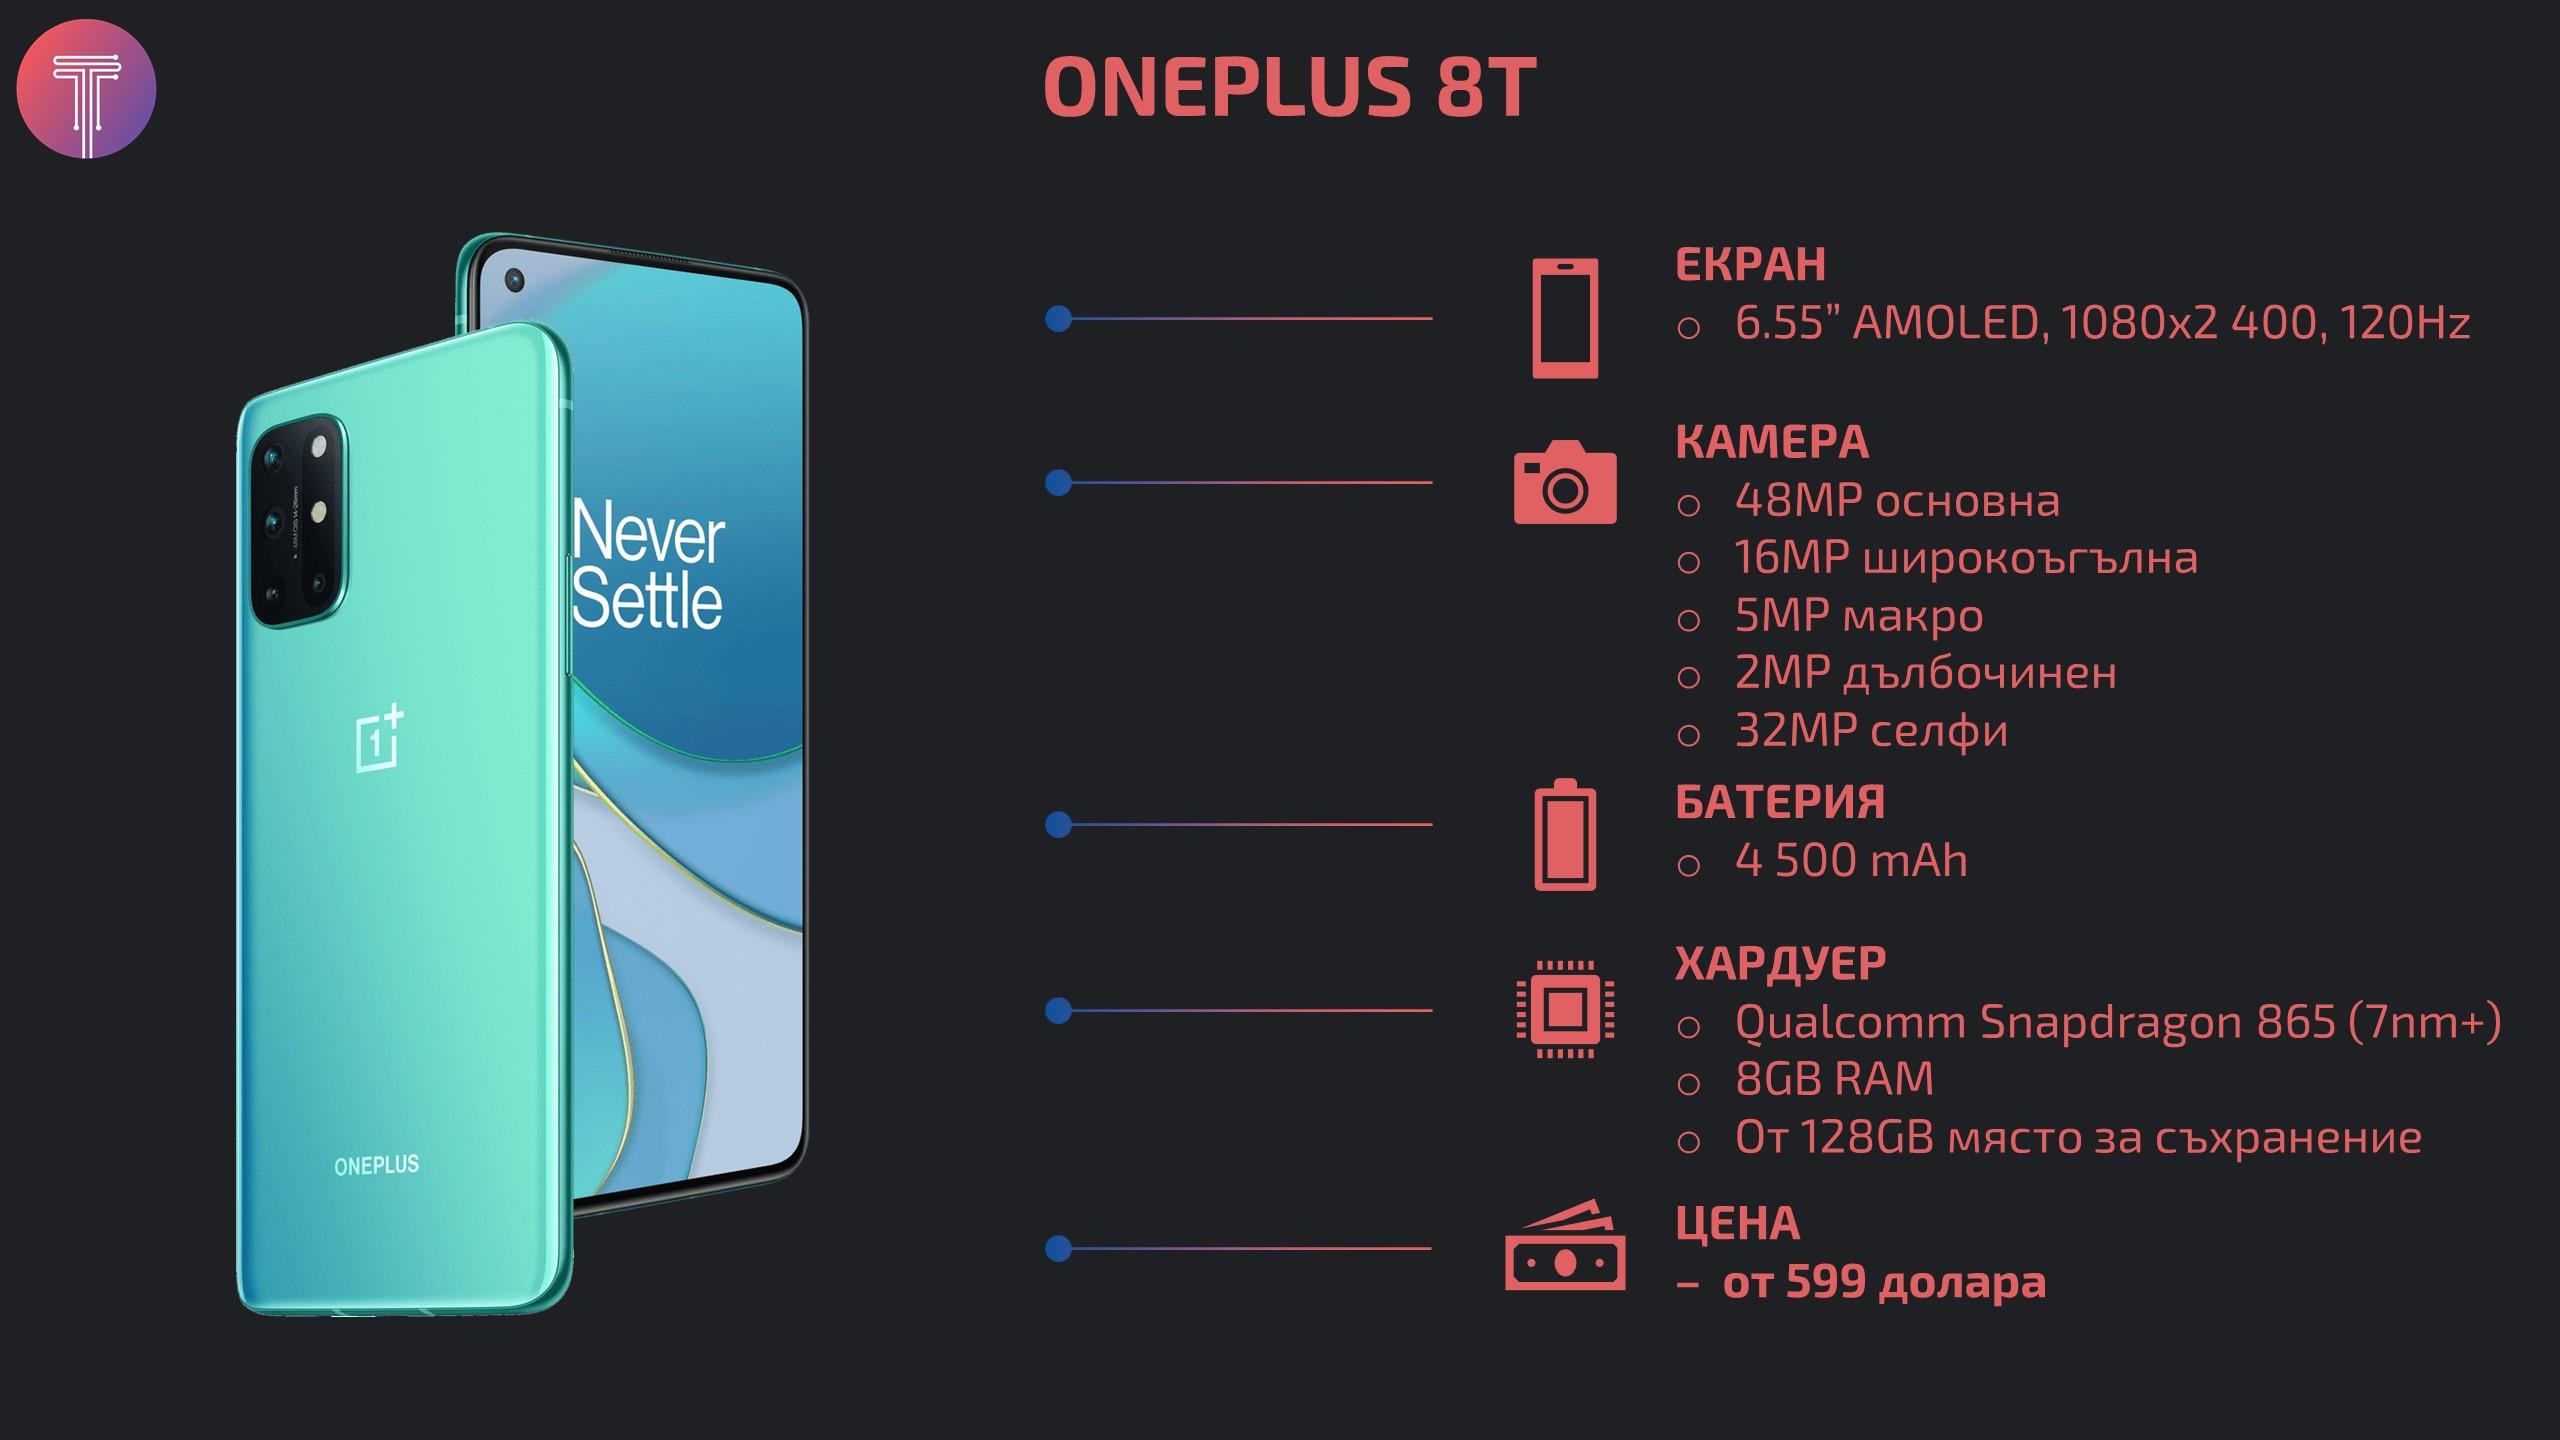 OnePlus-8t-infographic